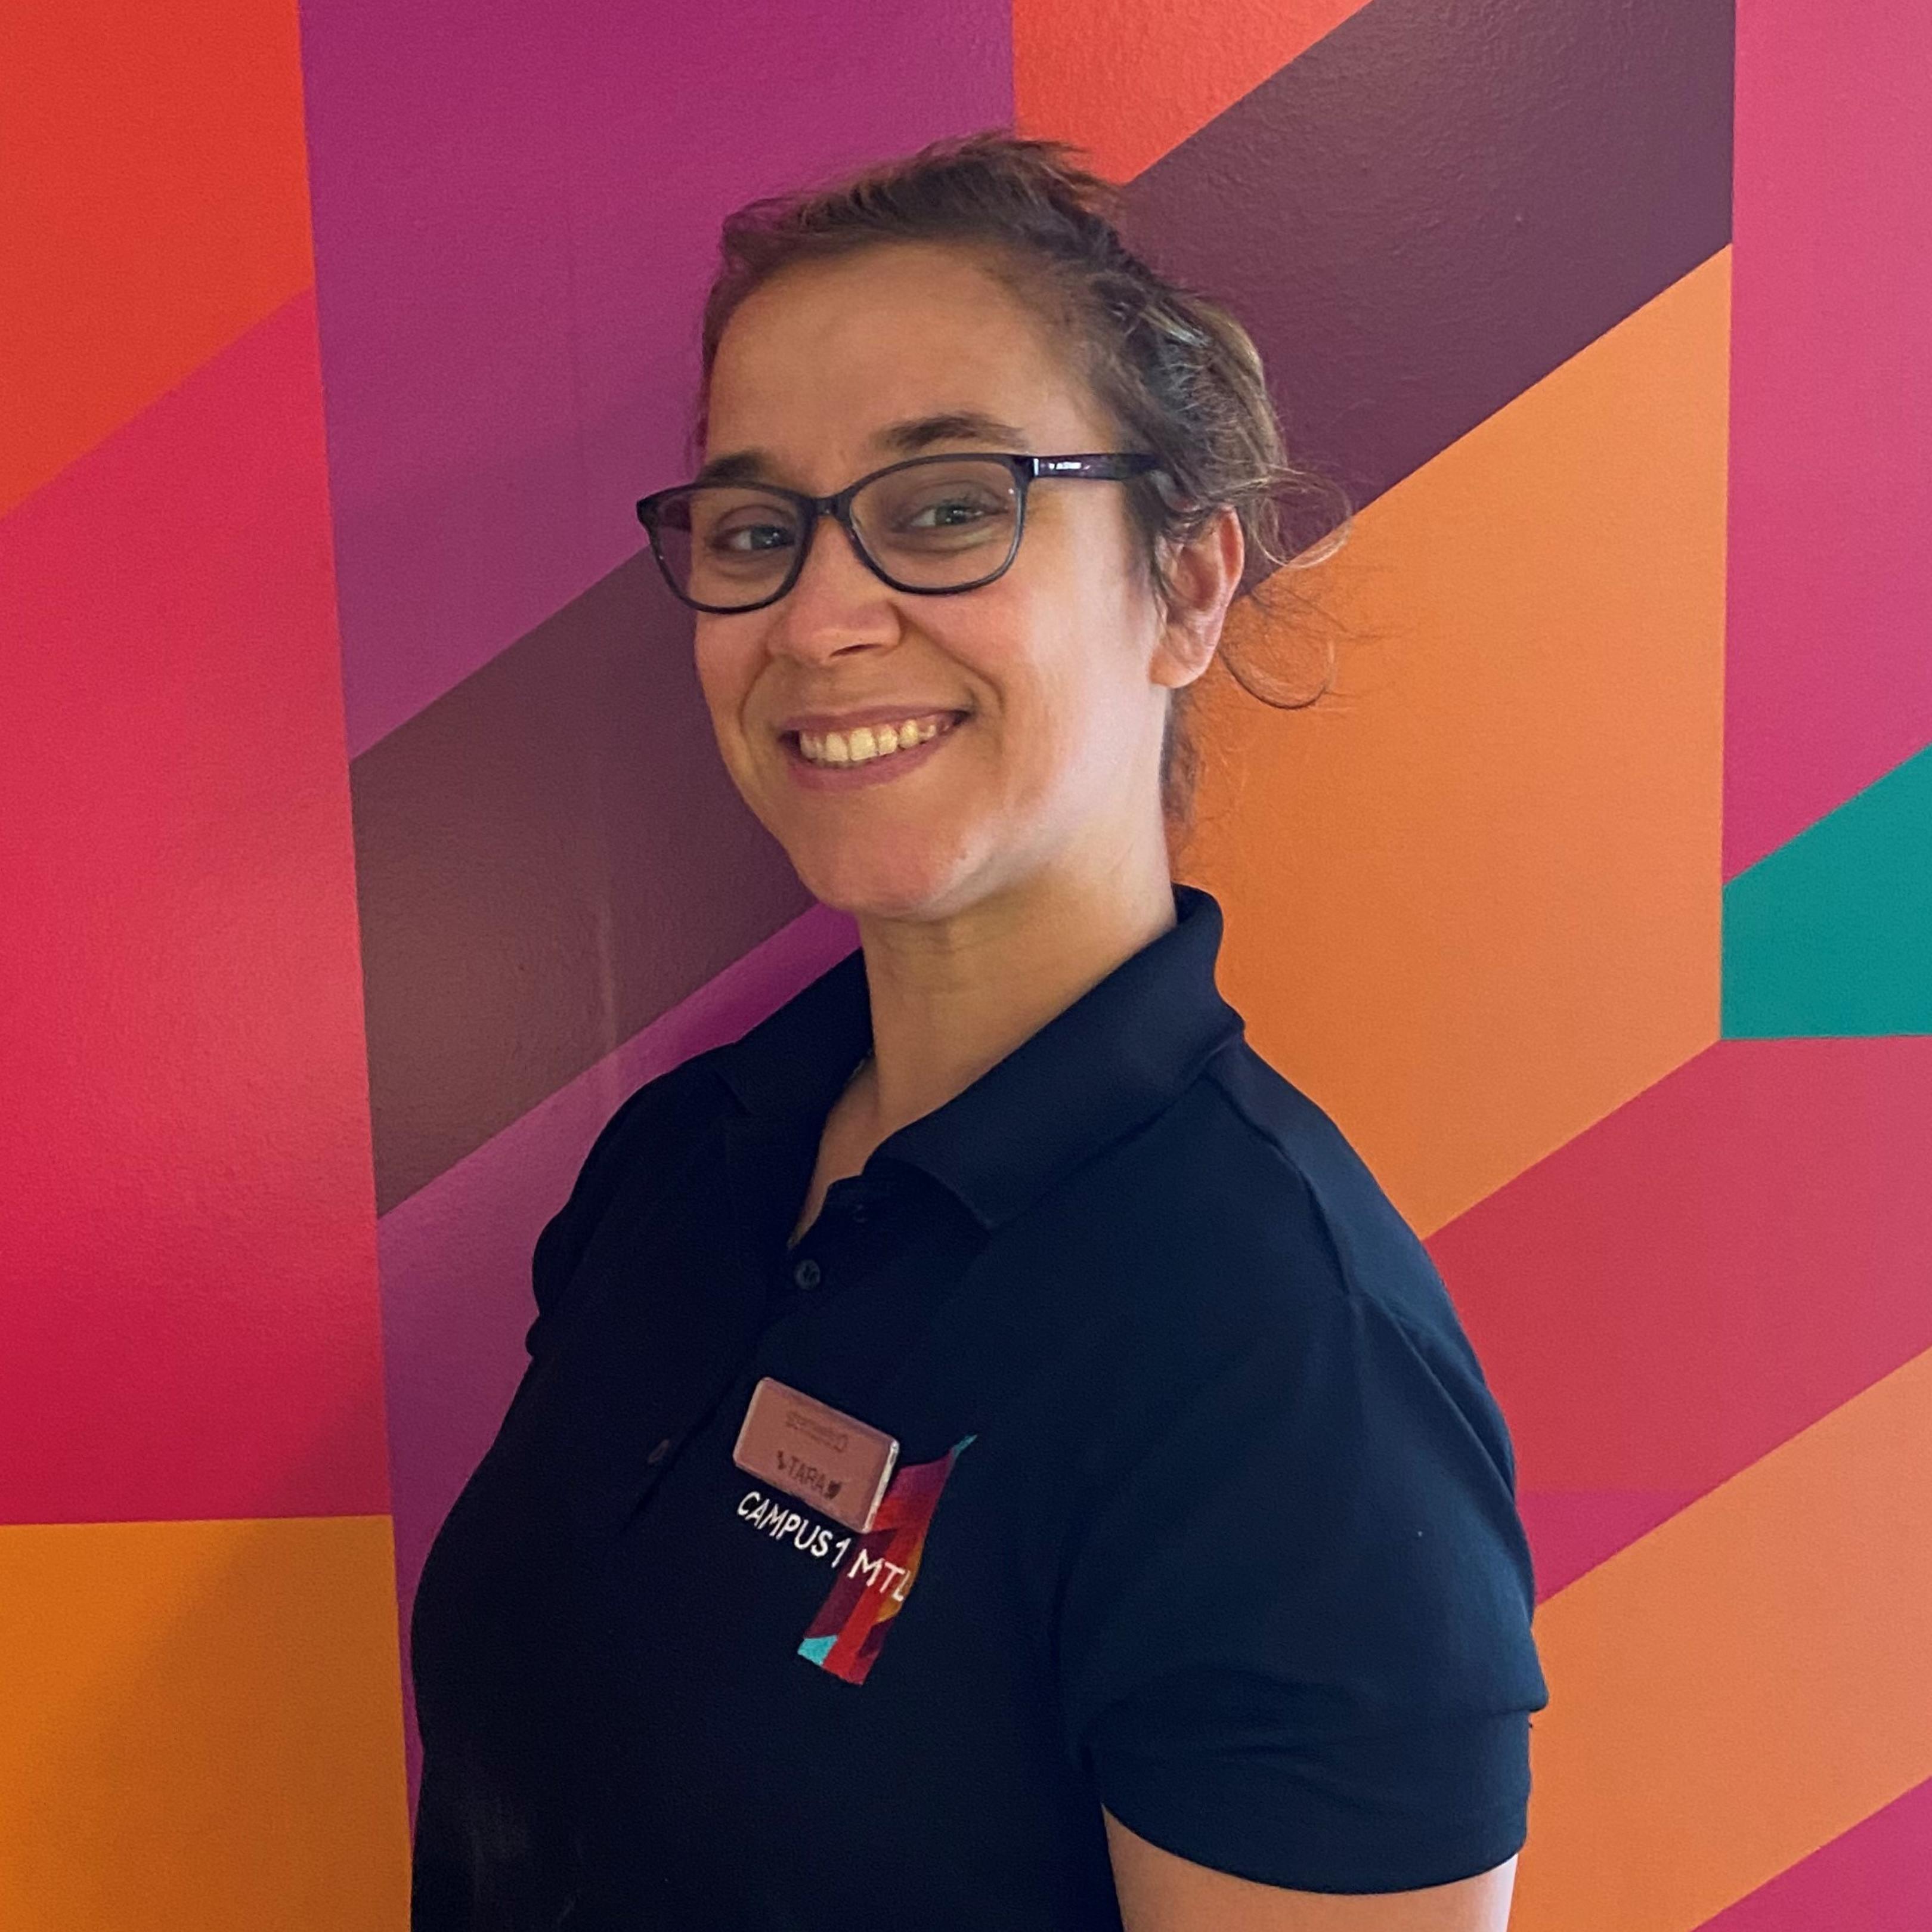 Tara Salinitri - Assistant Manager